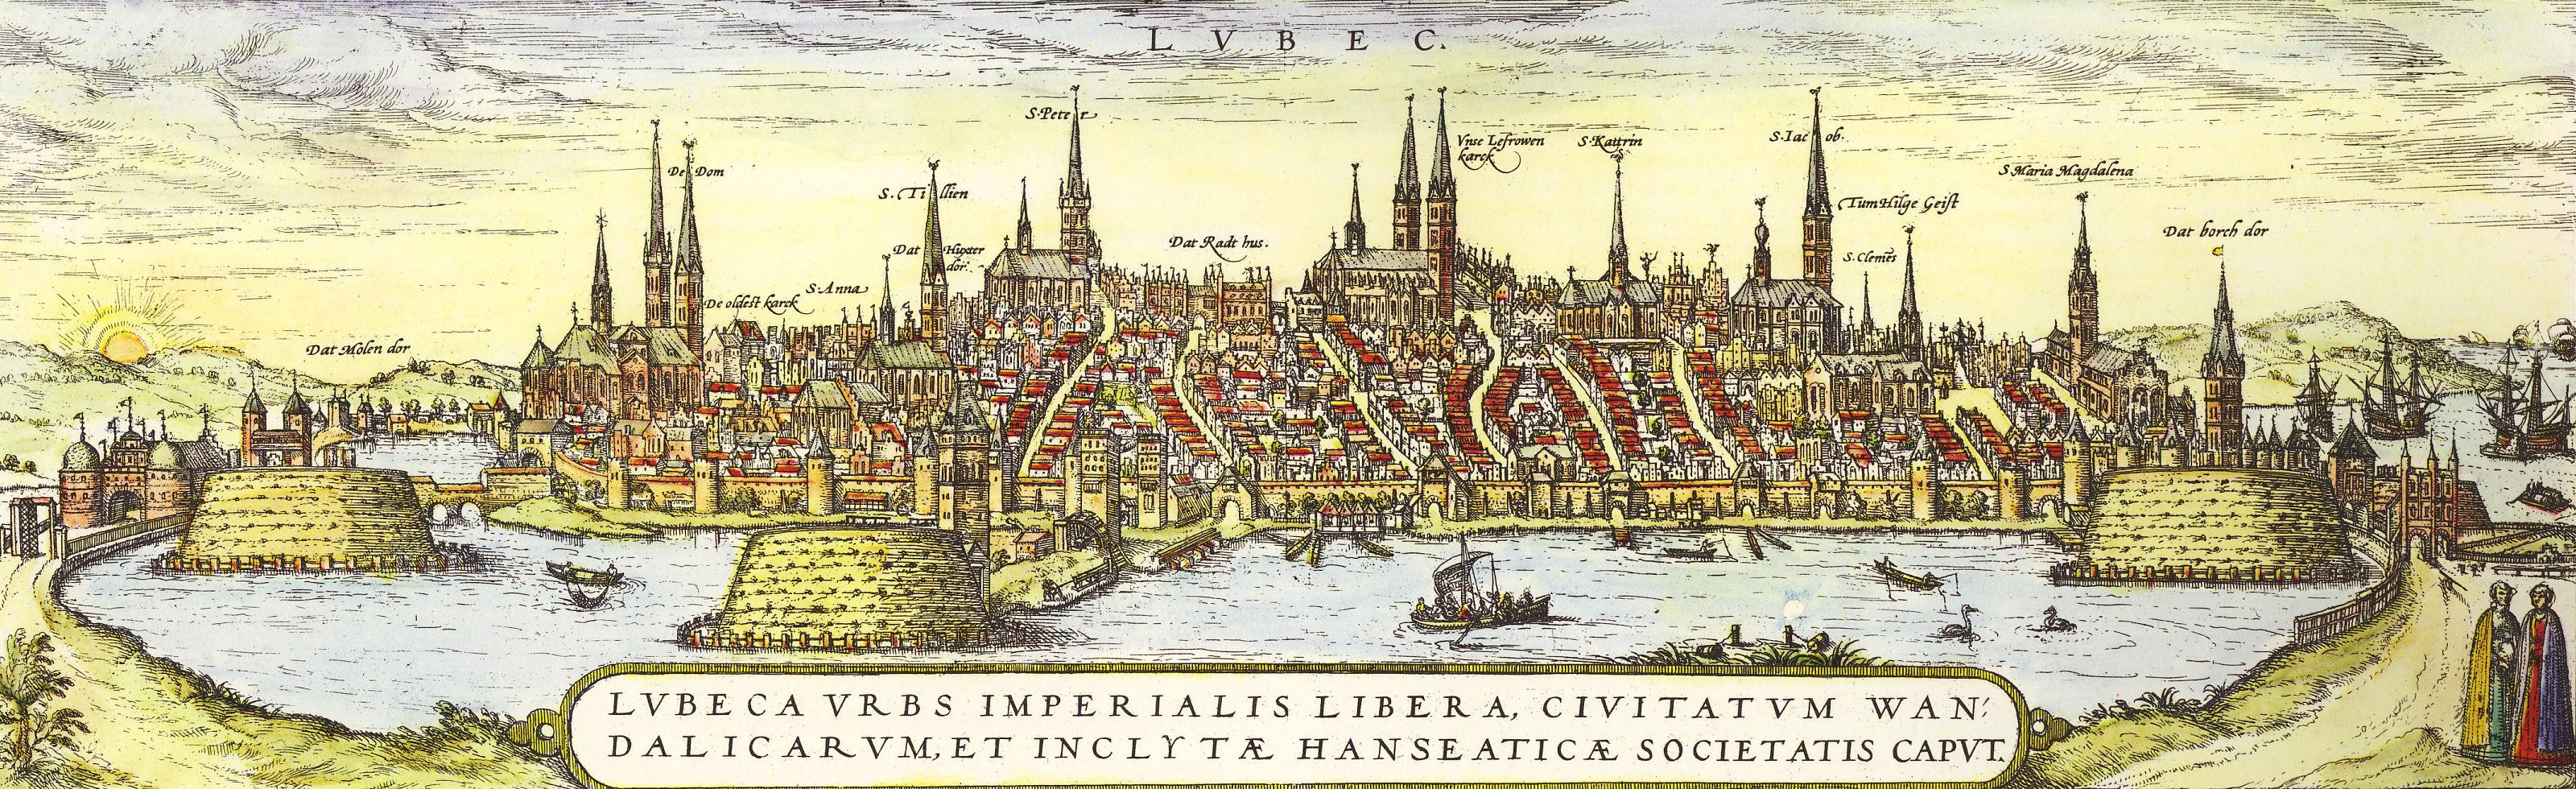 http://upload.wikimedia.org/wikipedia/commons/7/7b/Luebeck_Braun-Hogenberg.jpg